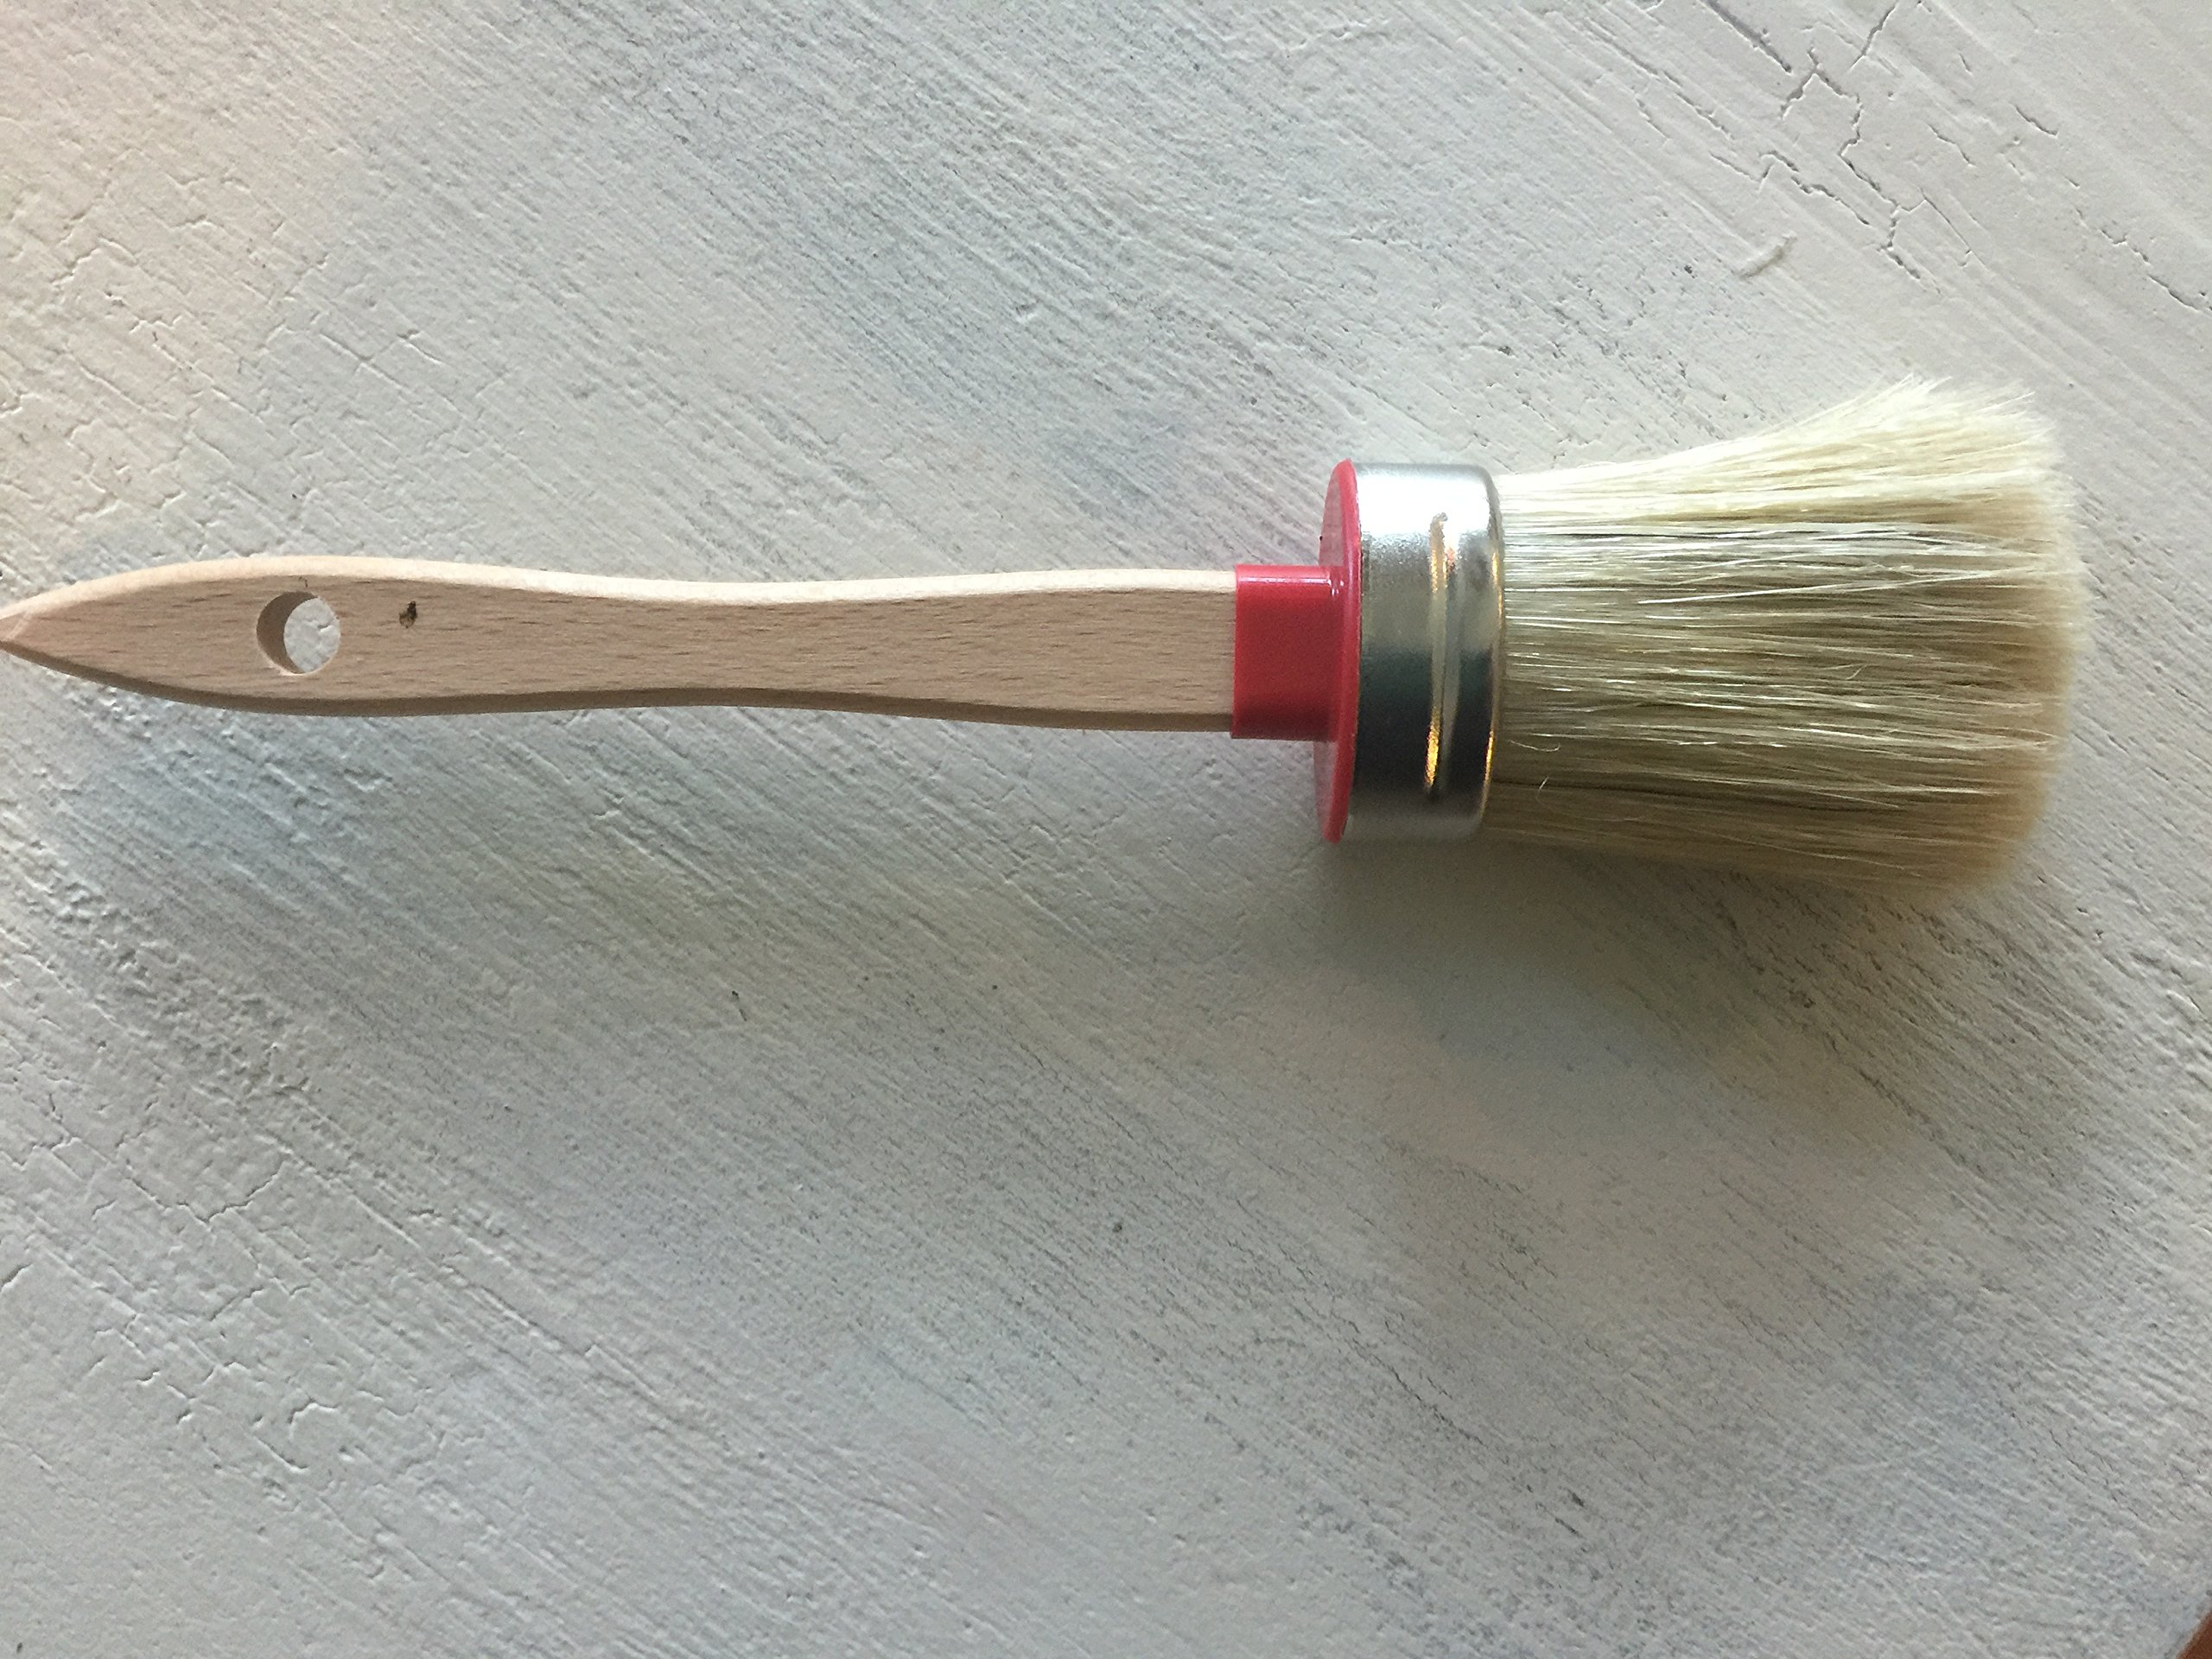 Chalkology Artisan Series - Oval Chalk Paint Waxing Brush, Small, Professional Brush, Pure Bristle, Varnished Wood Handle